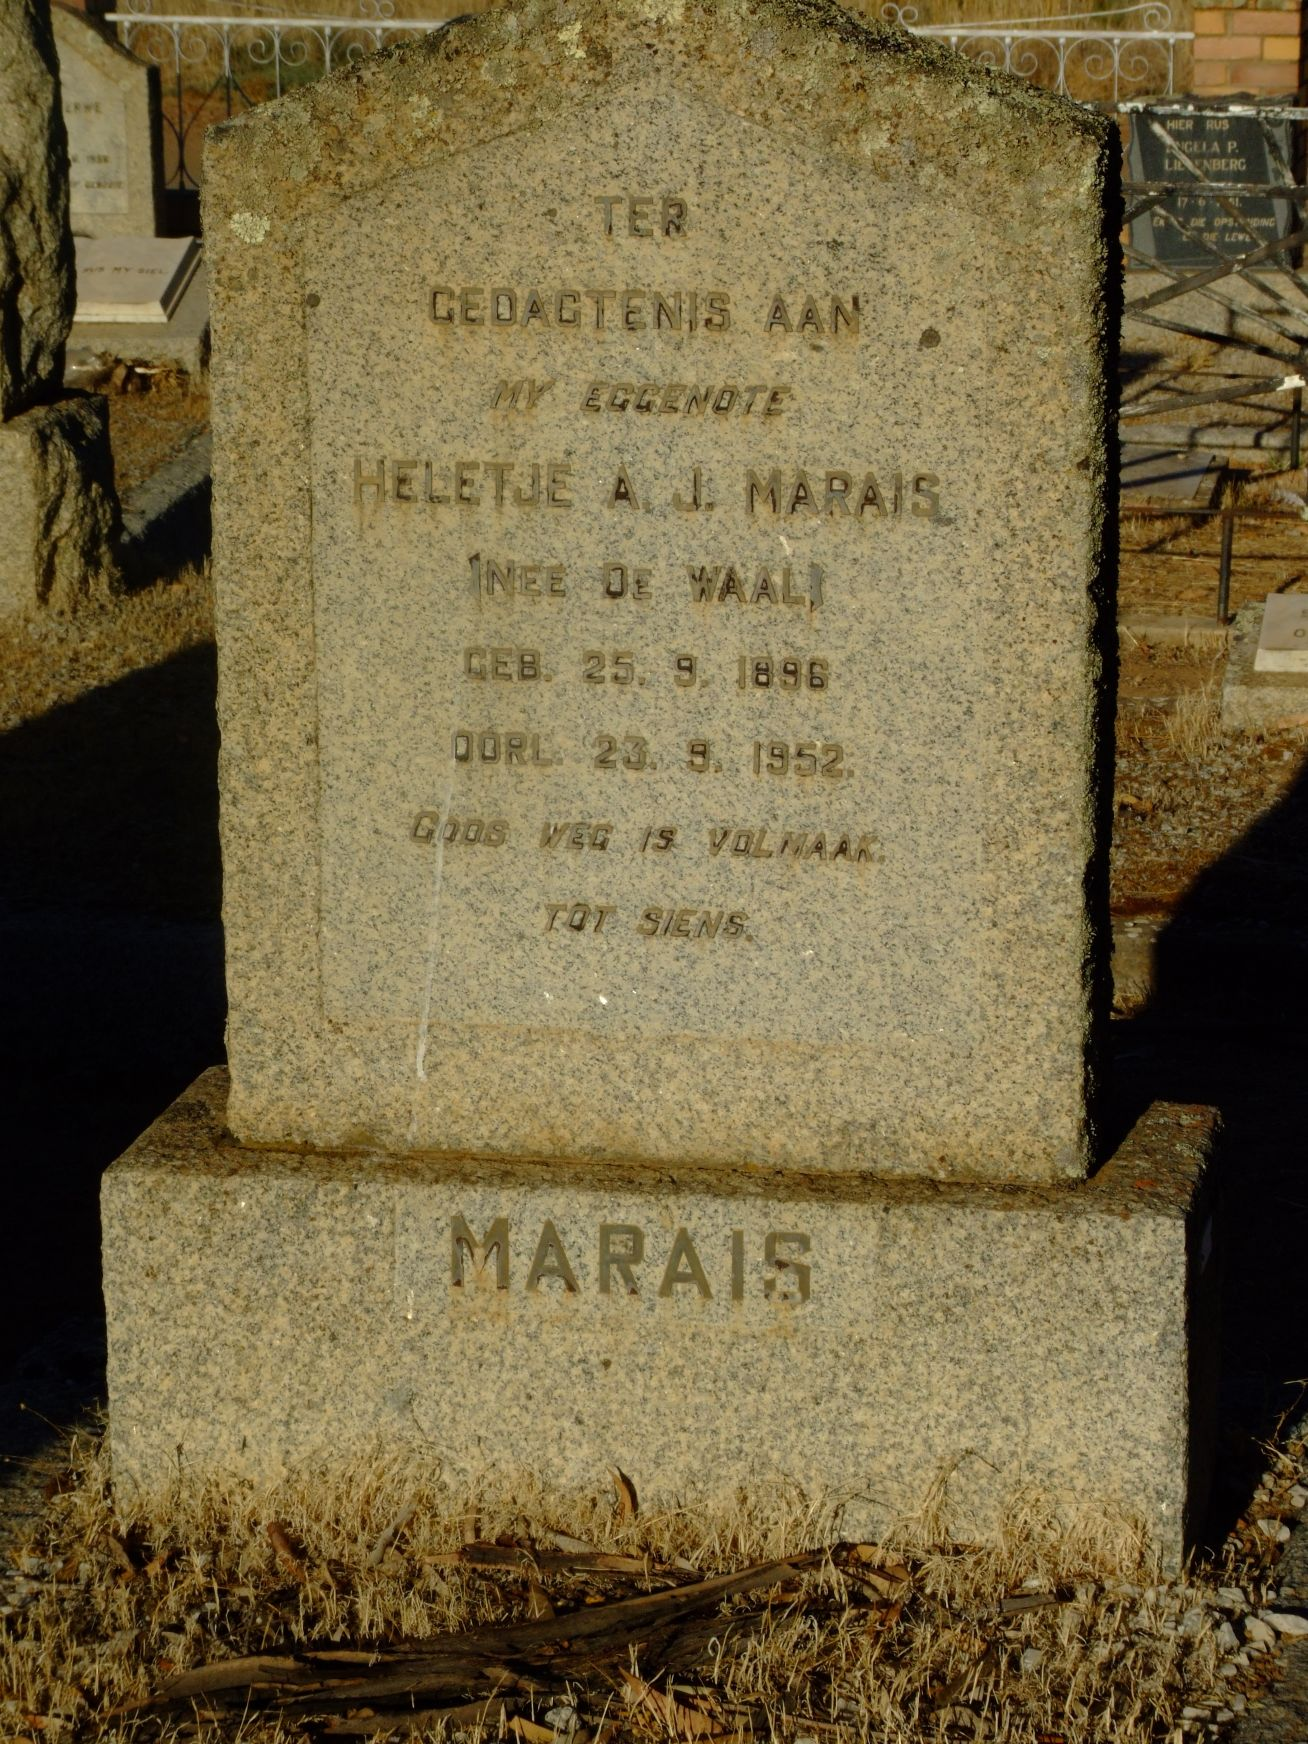 Marais, Heletje A. J. born de Waal